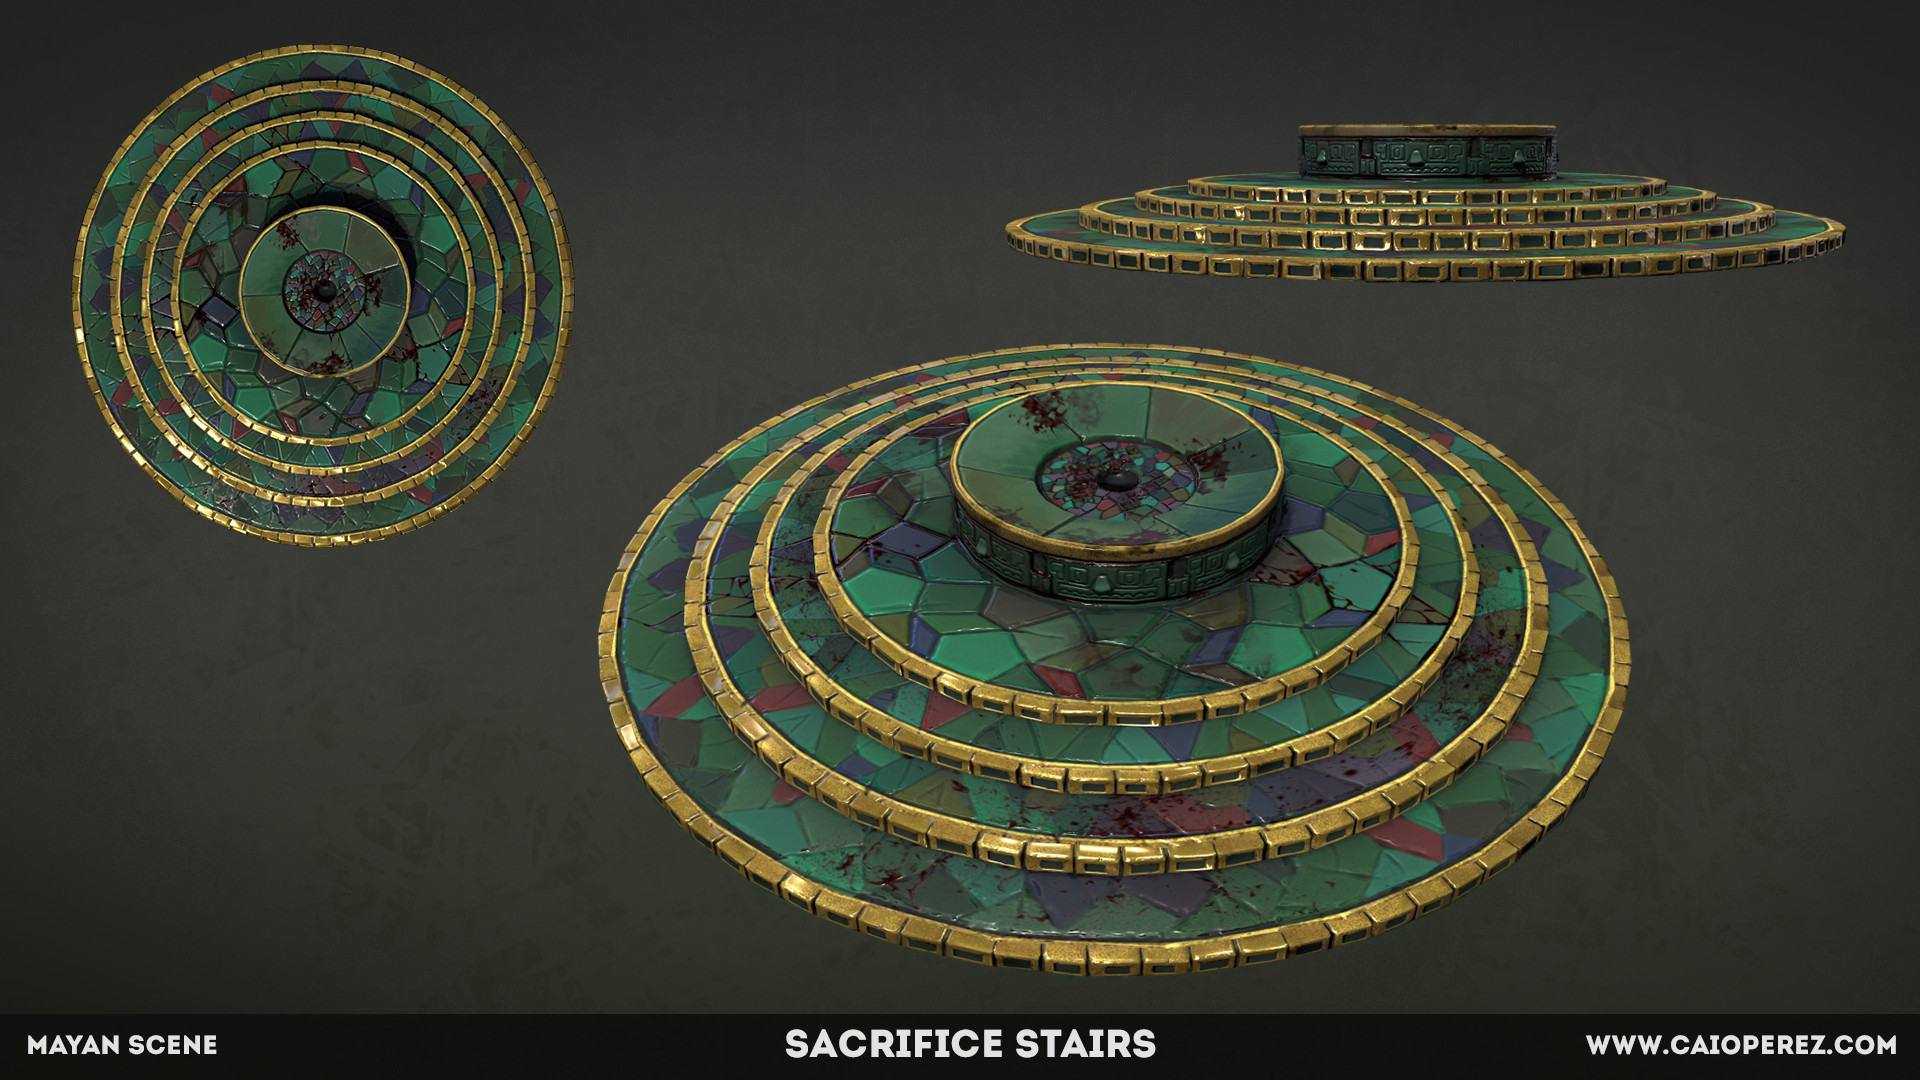 Caio perez sacrifice stairs